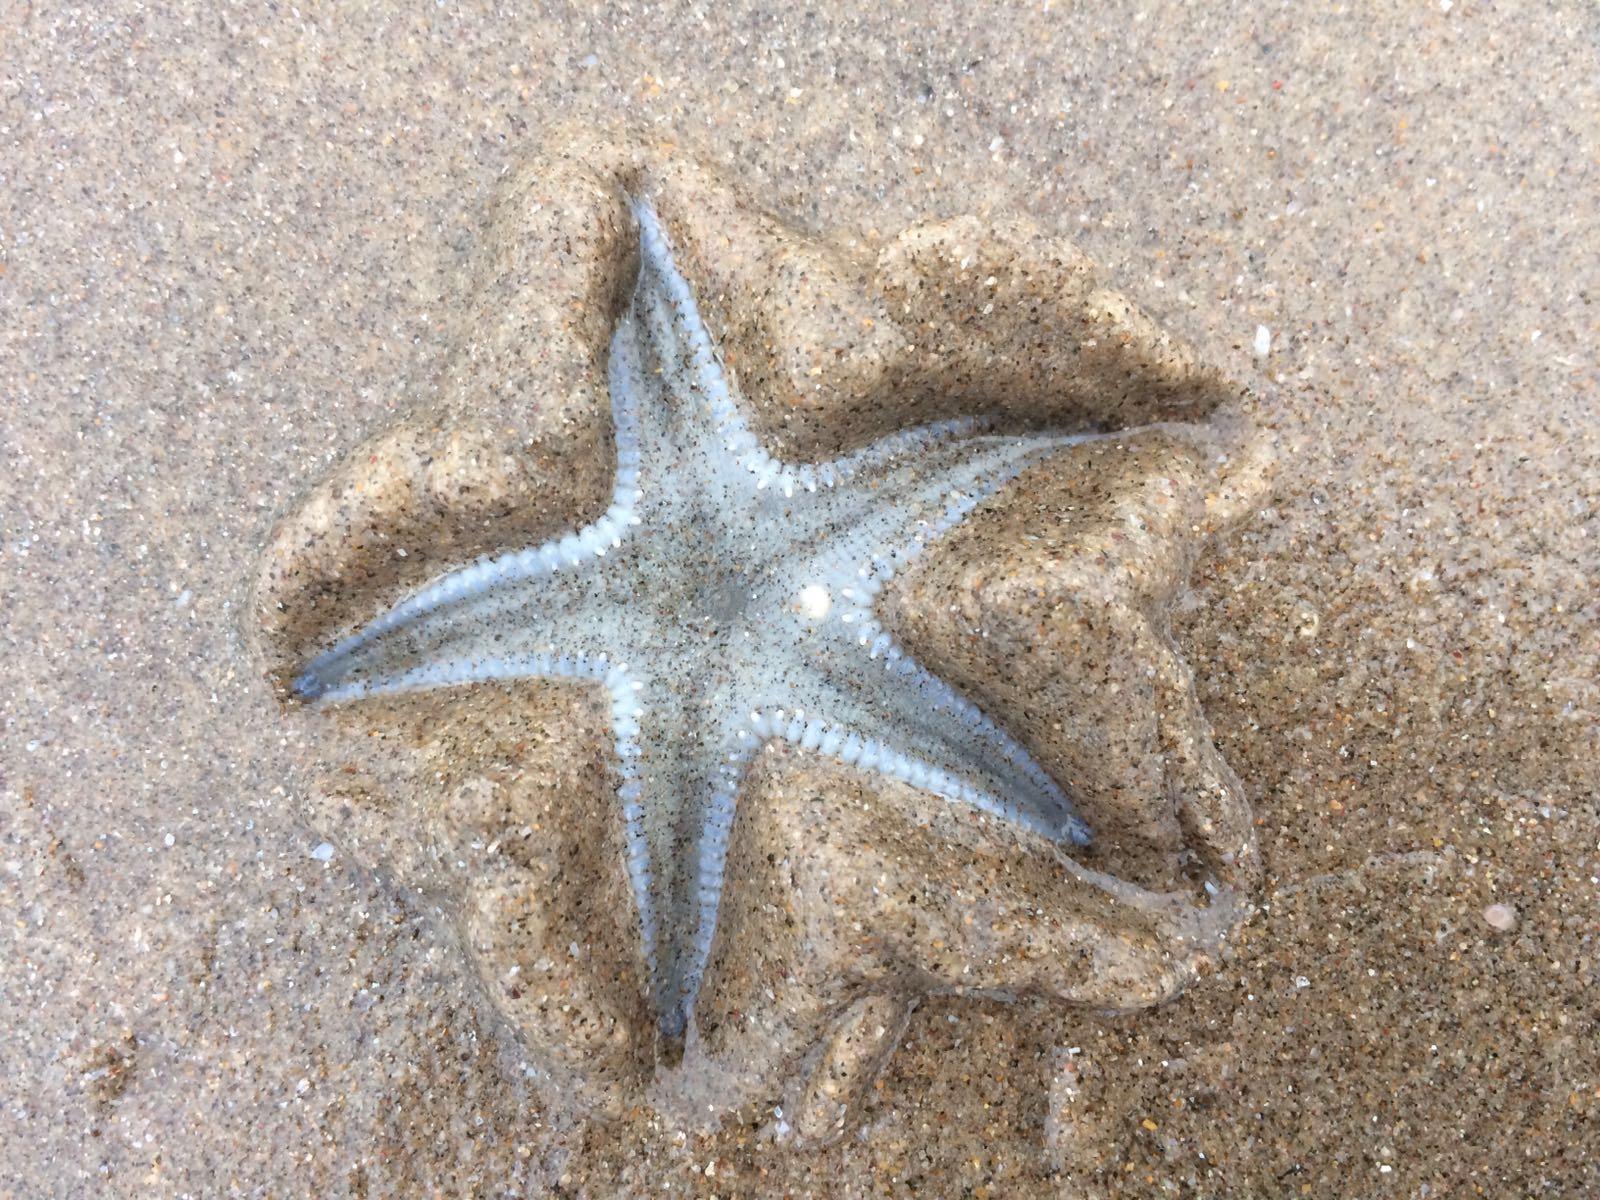 Star Fish Goa.JPG